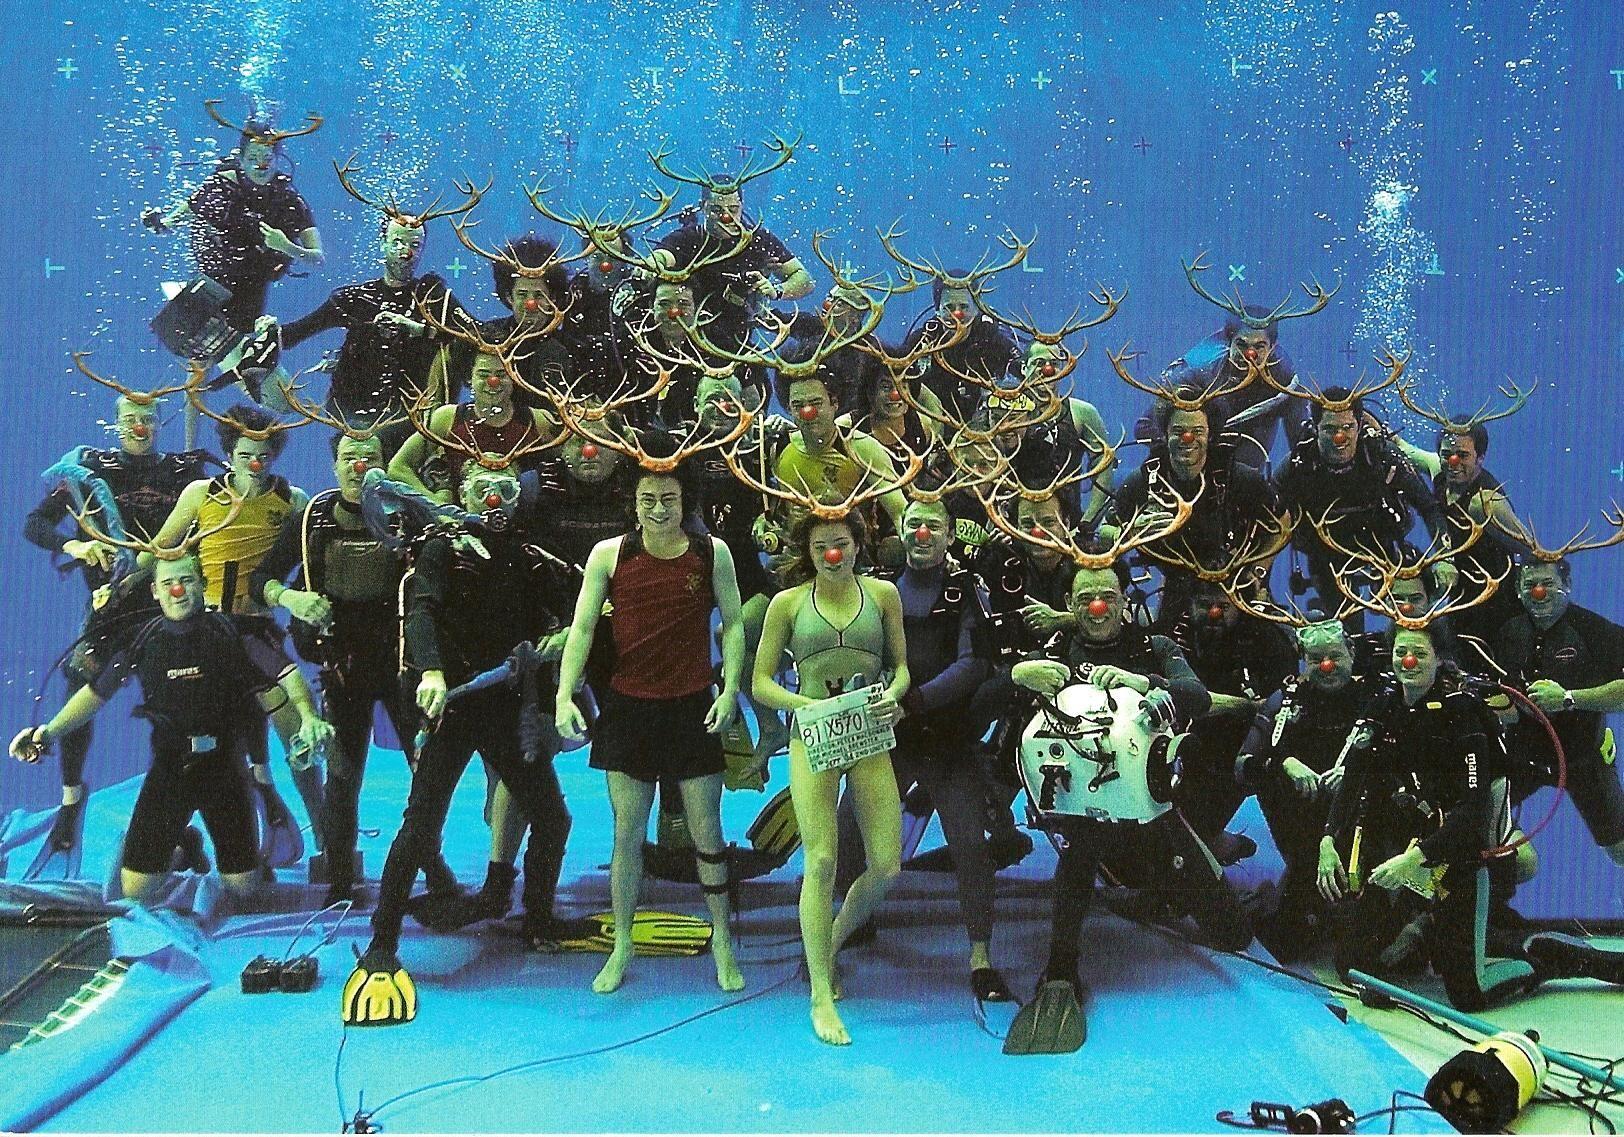 Xmas Card Underwater Scene Harry Potter Daniel Radcliffe